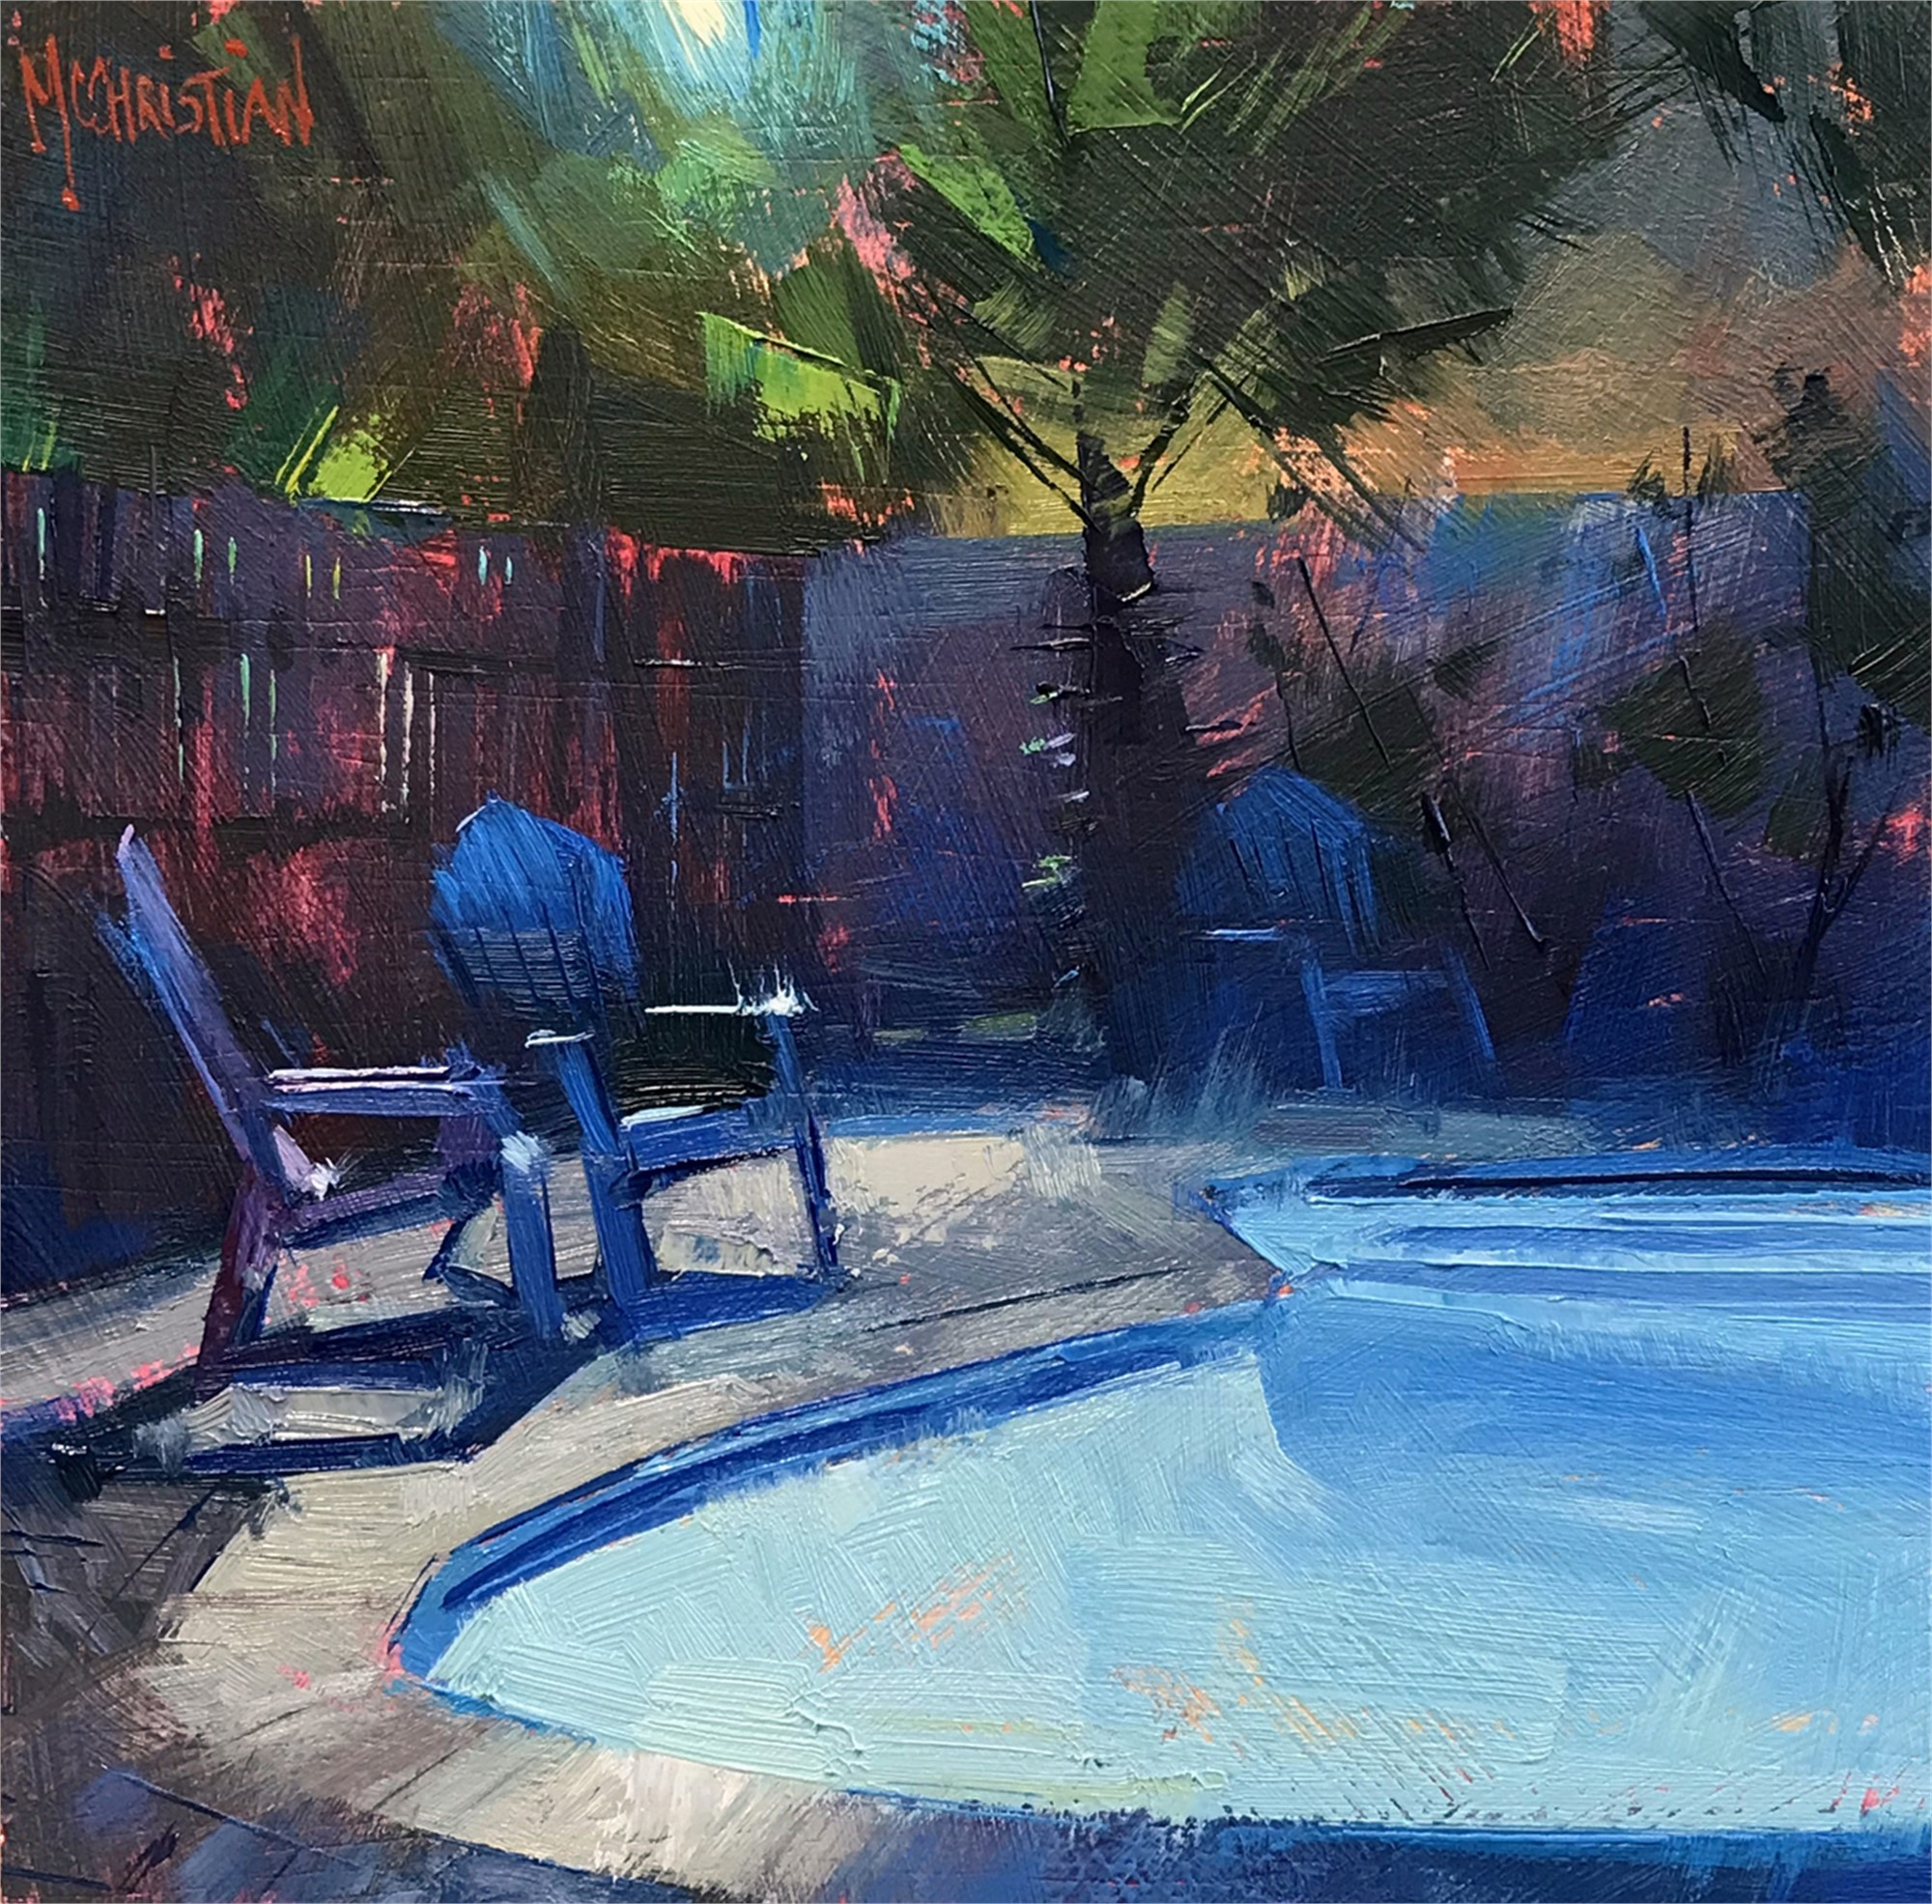 Serene Submersion by Jennifer McChristian